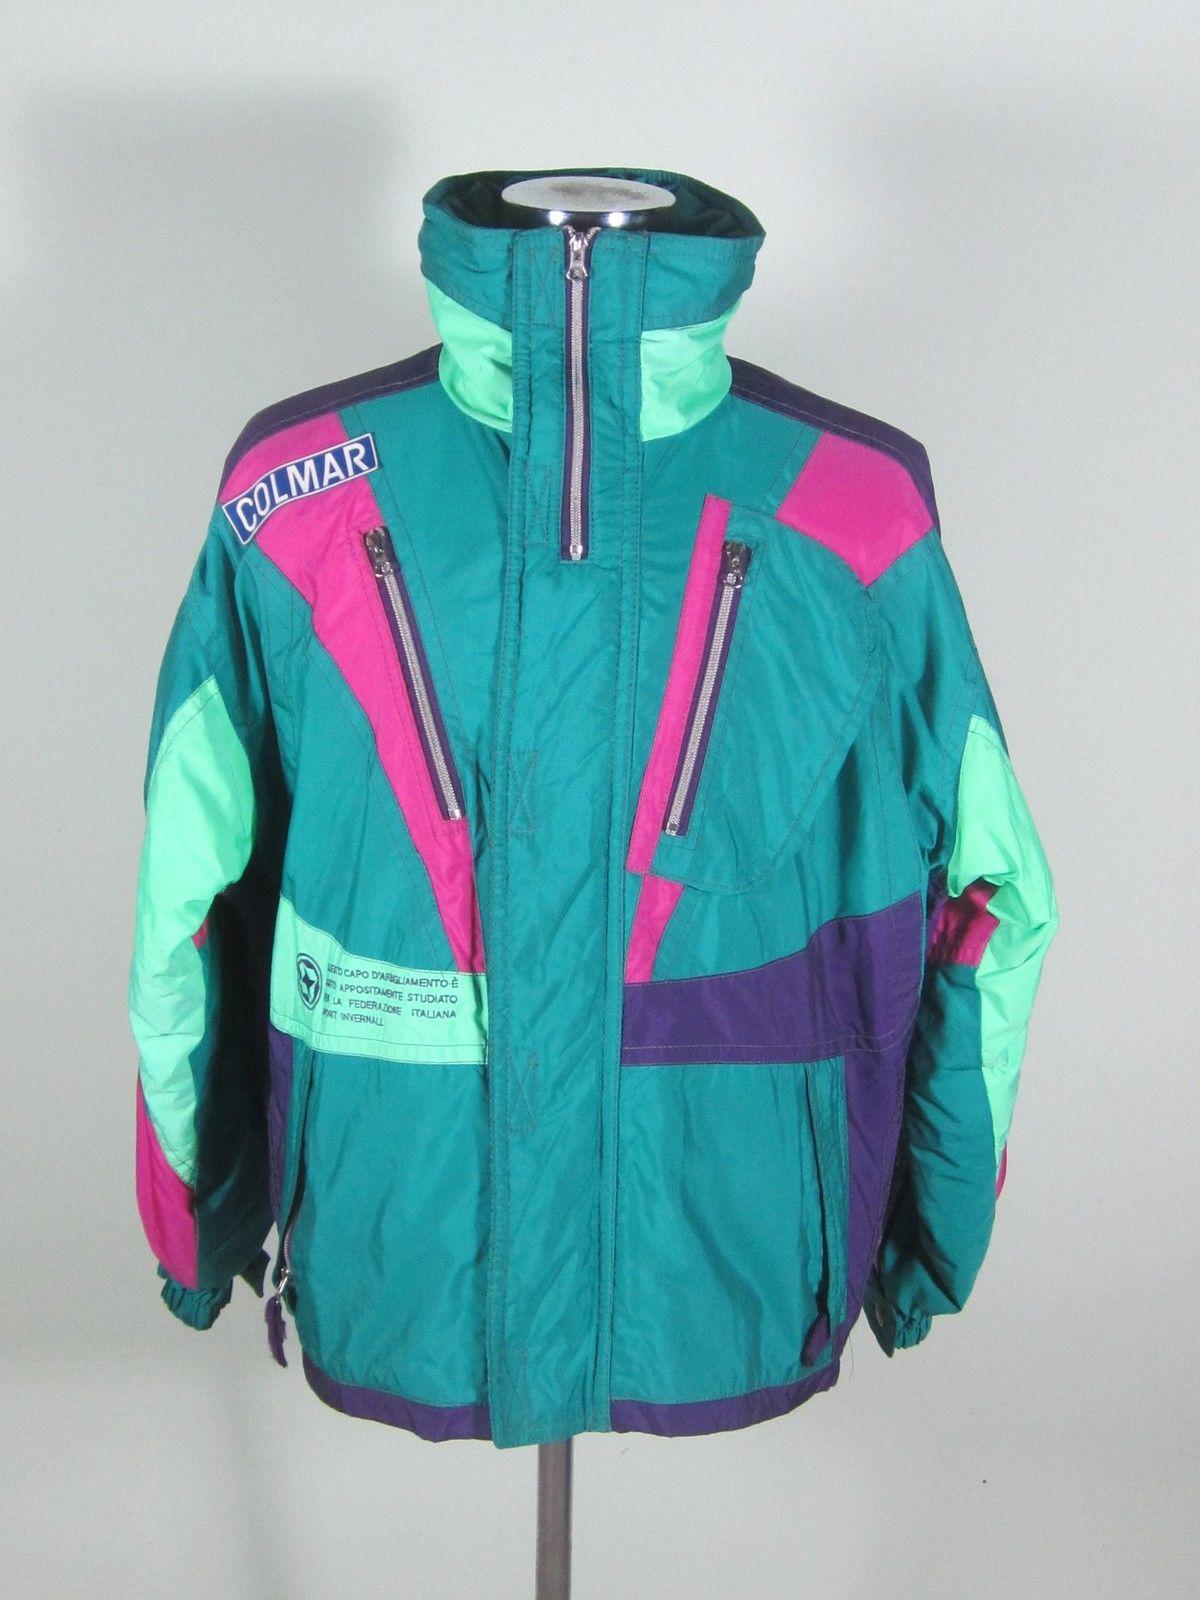 Vintage Colmar Ski Jacket 727b644a8